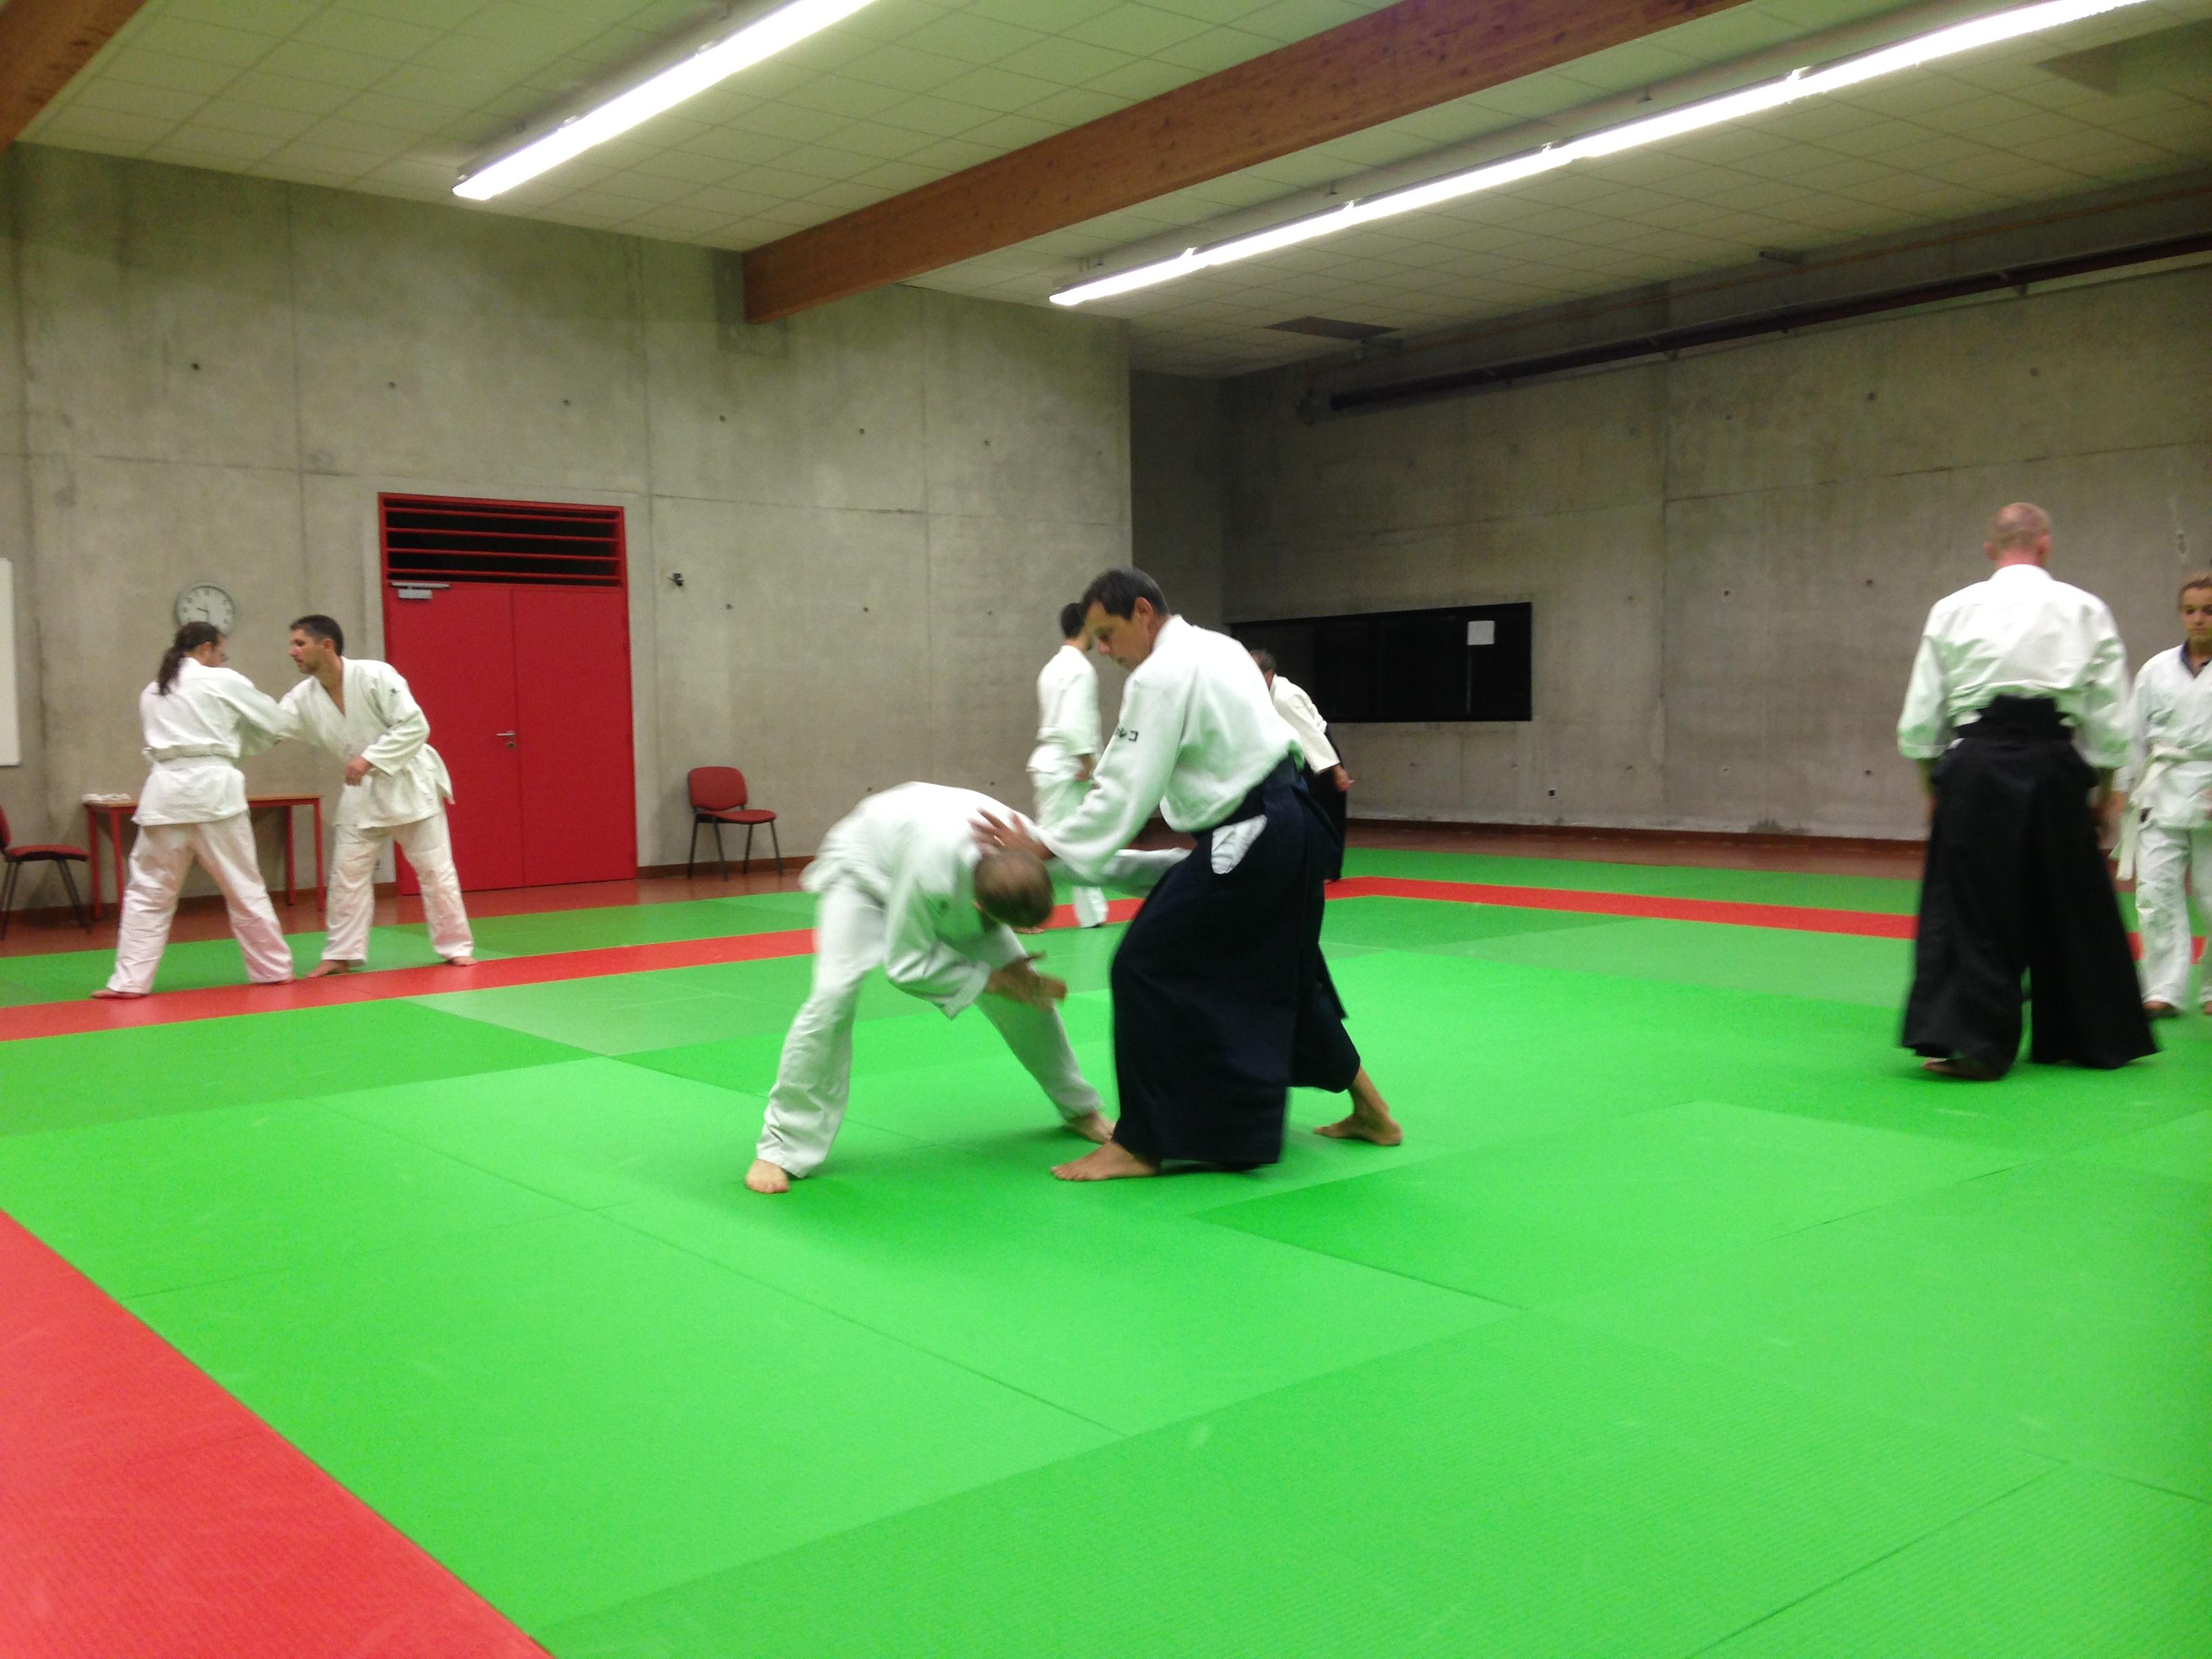 Aikido Salle De Bain ~  ronin le blog de patrice aikido blog trotter ma